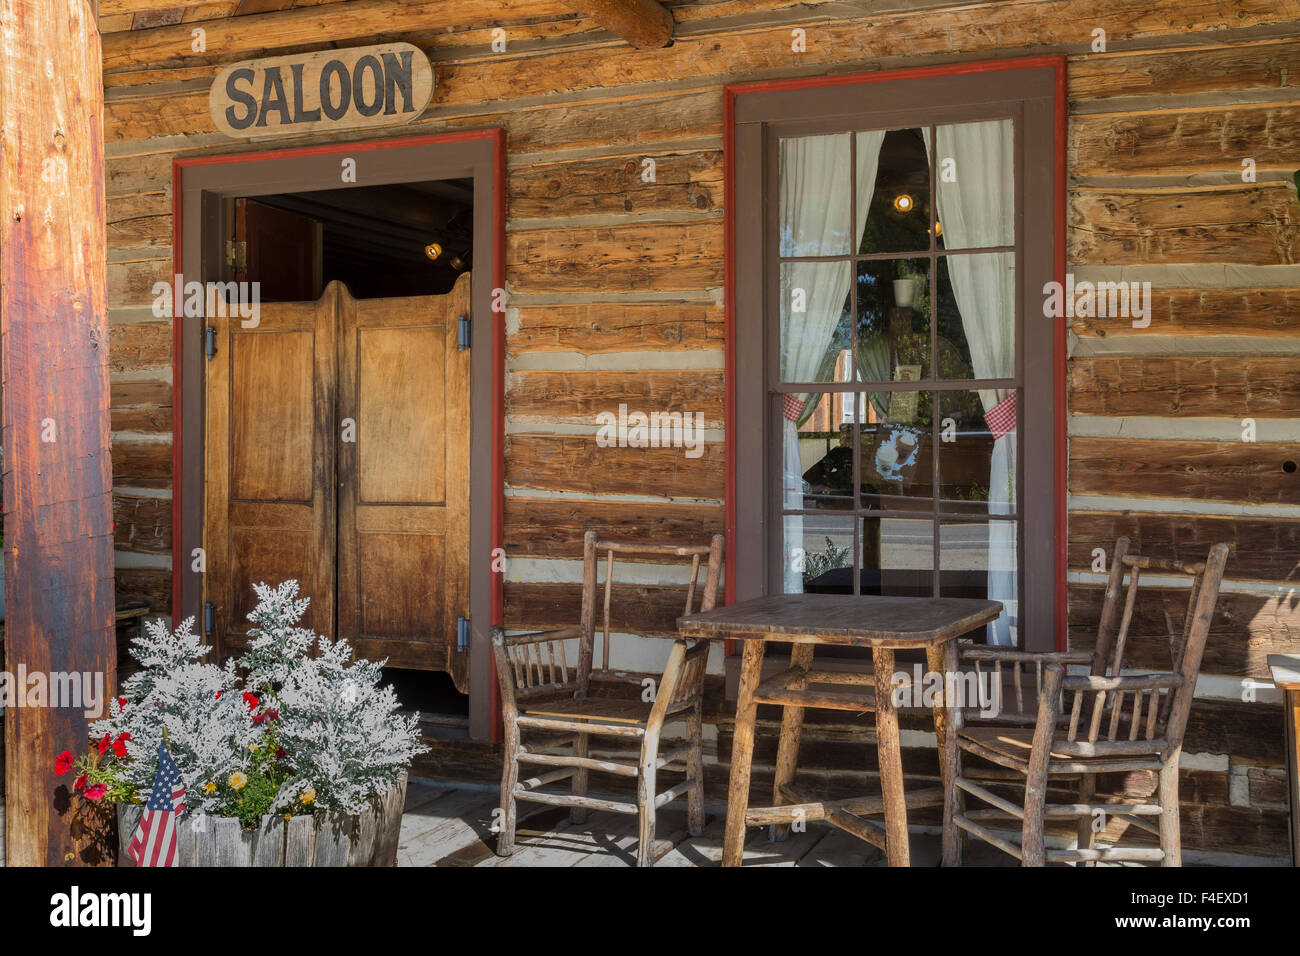 USA, Montana, Nevada City. Outside of vintage saloon. Credit as: Don Paulson / Jaynes Gallery / DanitaDelimont.com - Stock Image